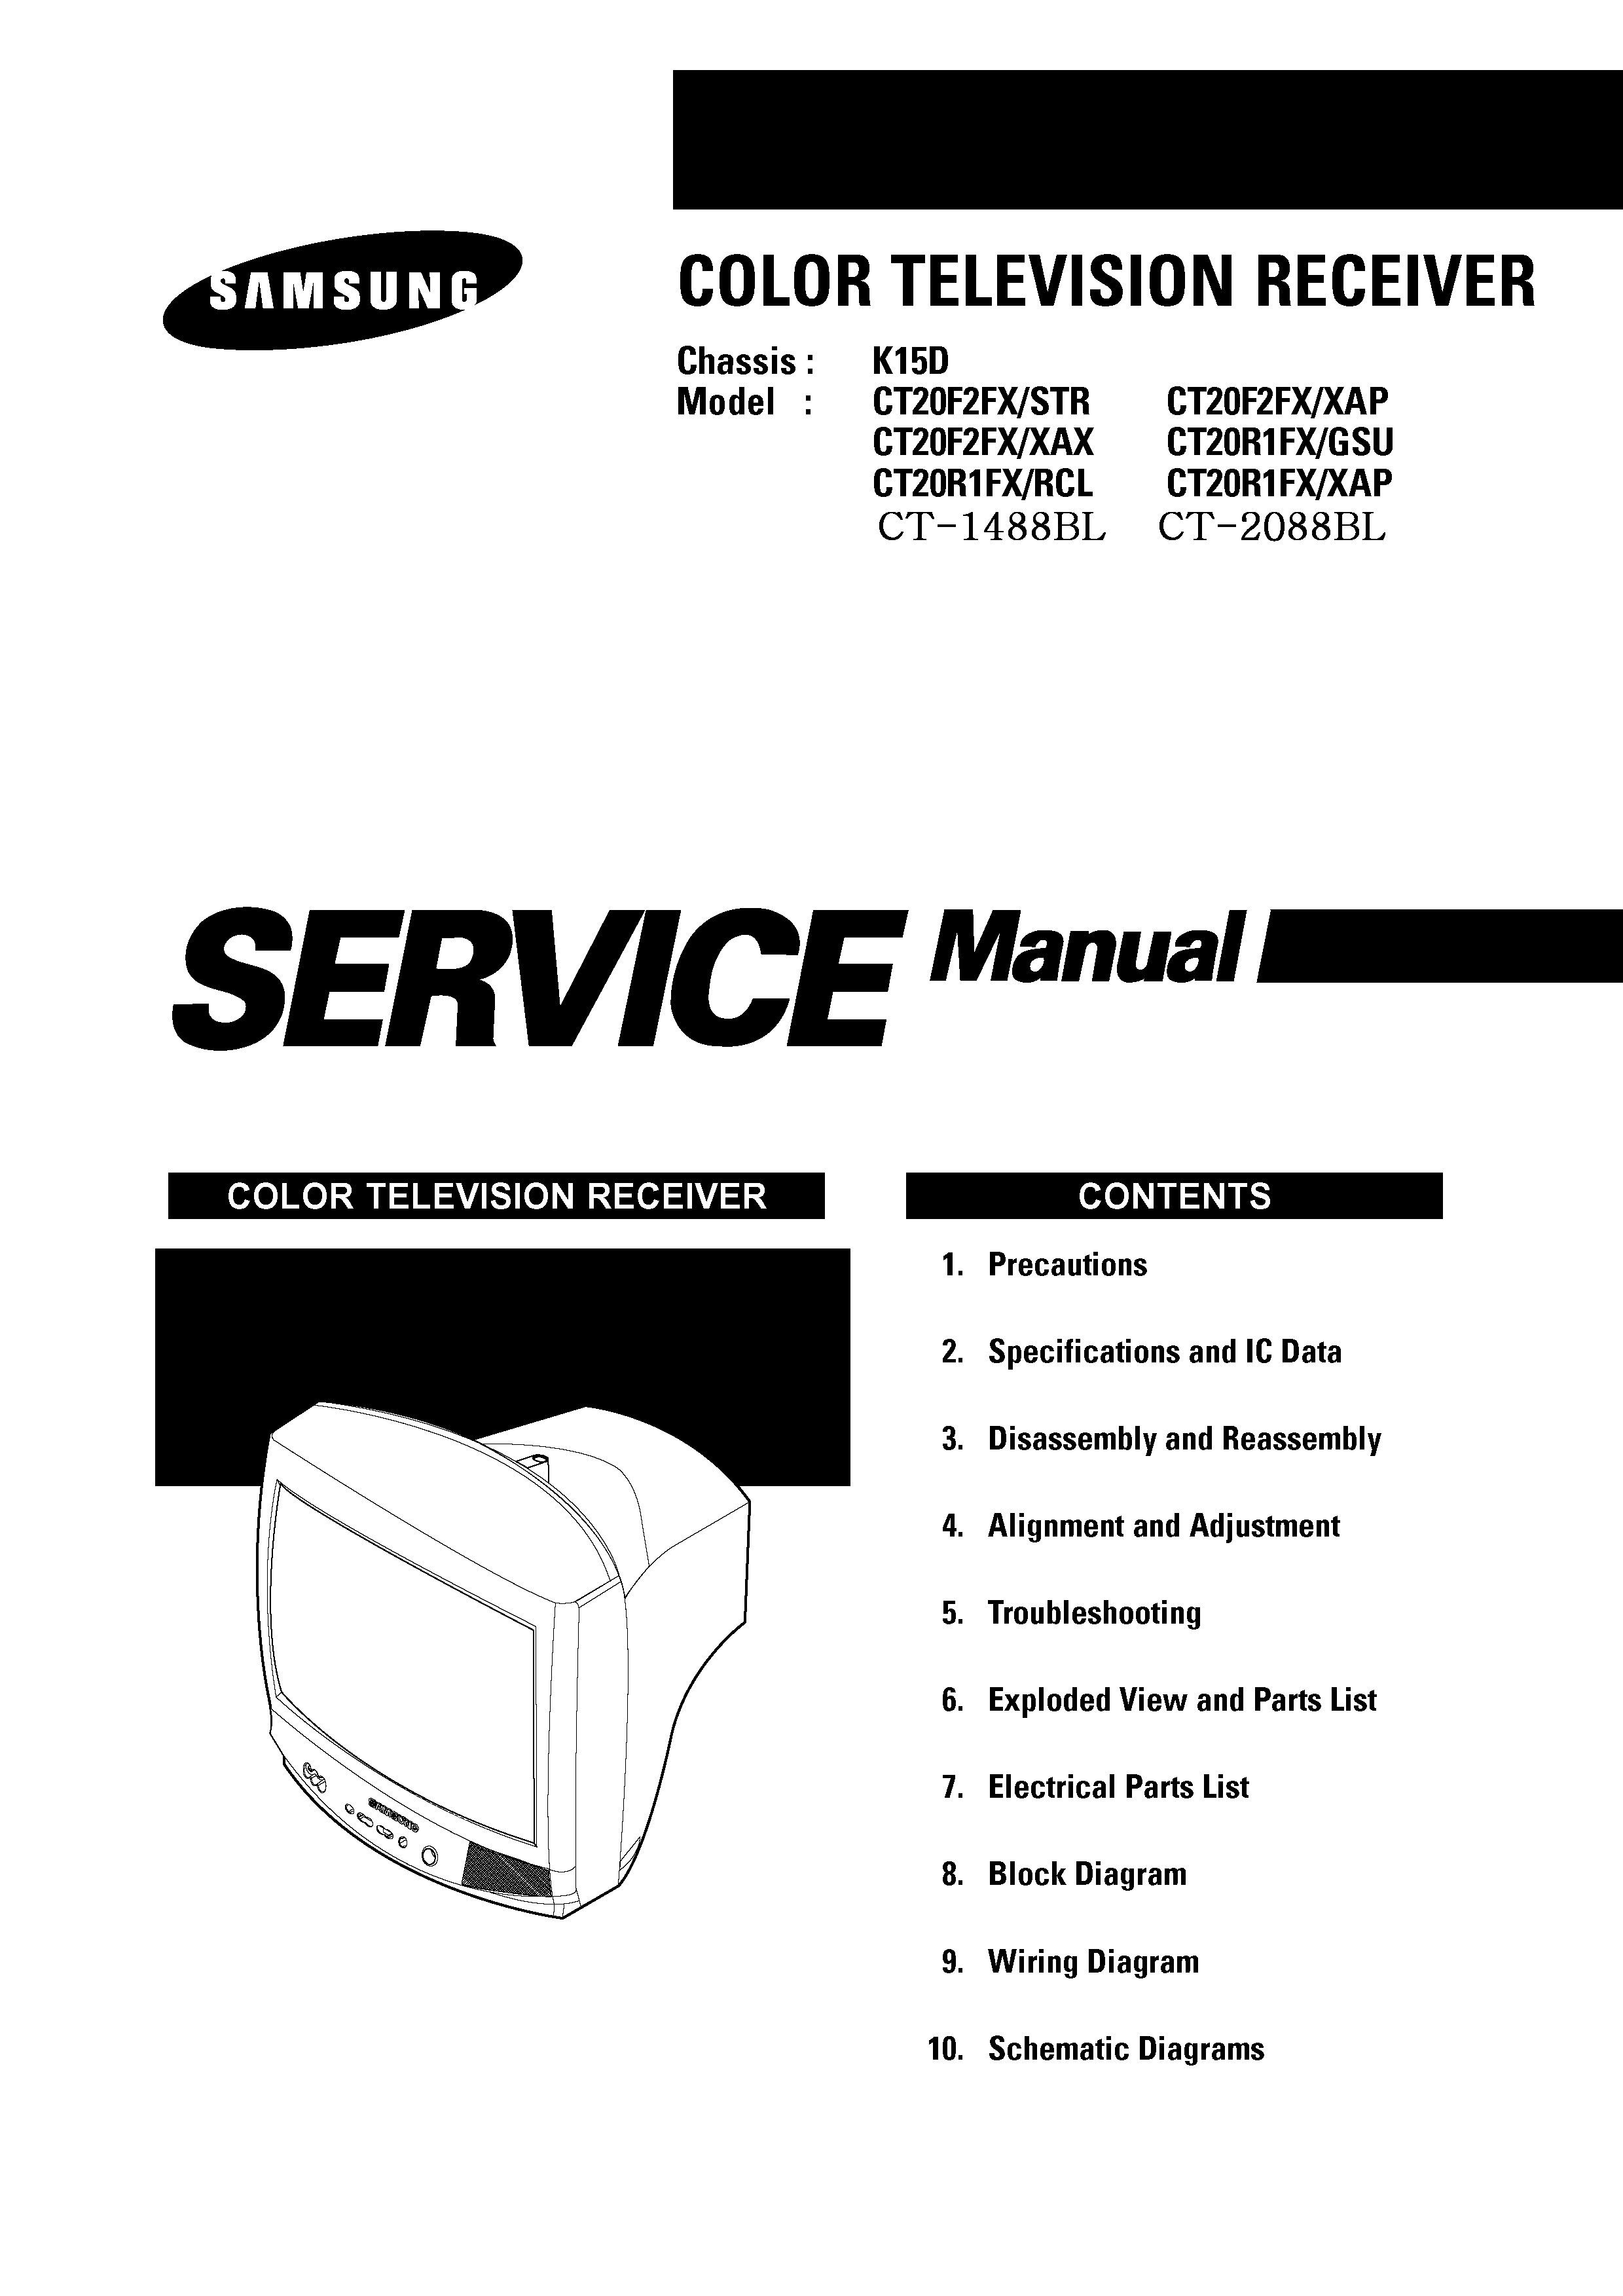 SAMSUNG Samsung ct2088 samsung ct 2088blct 20f2fxk15d pdf